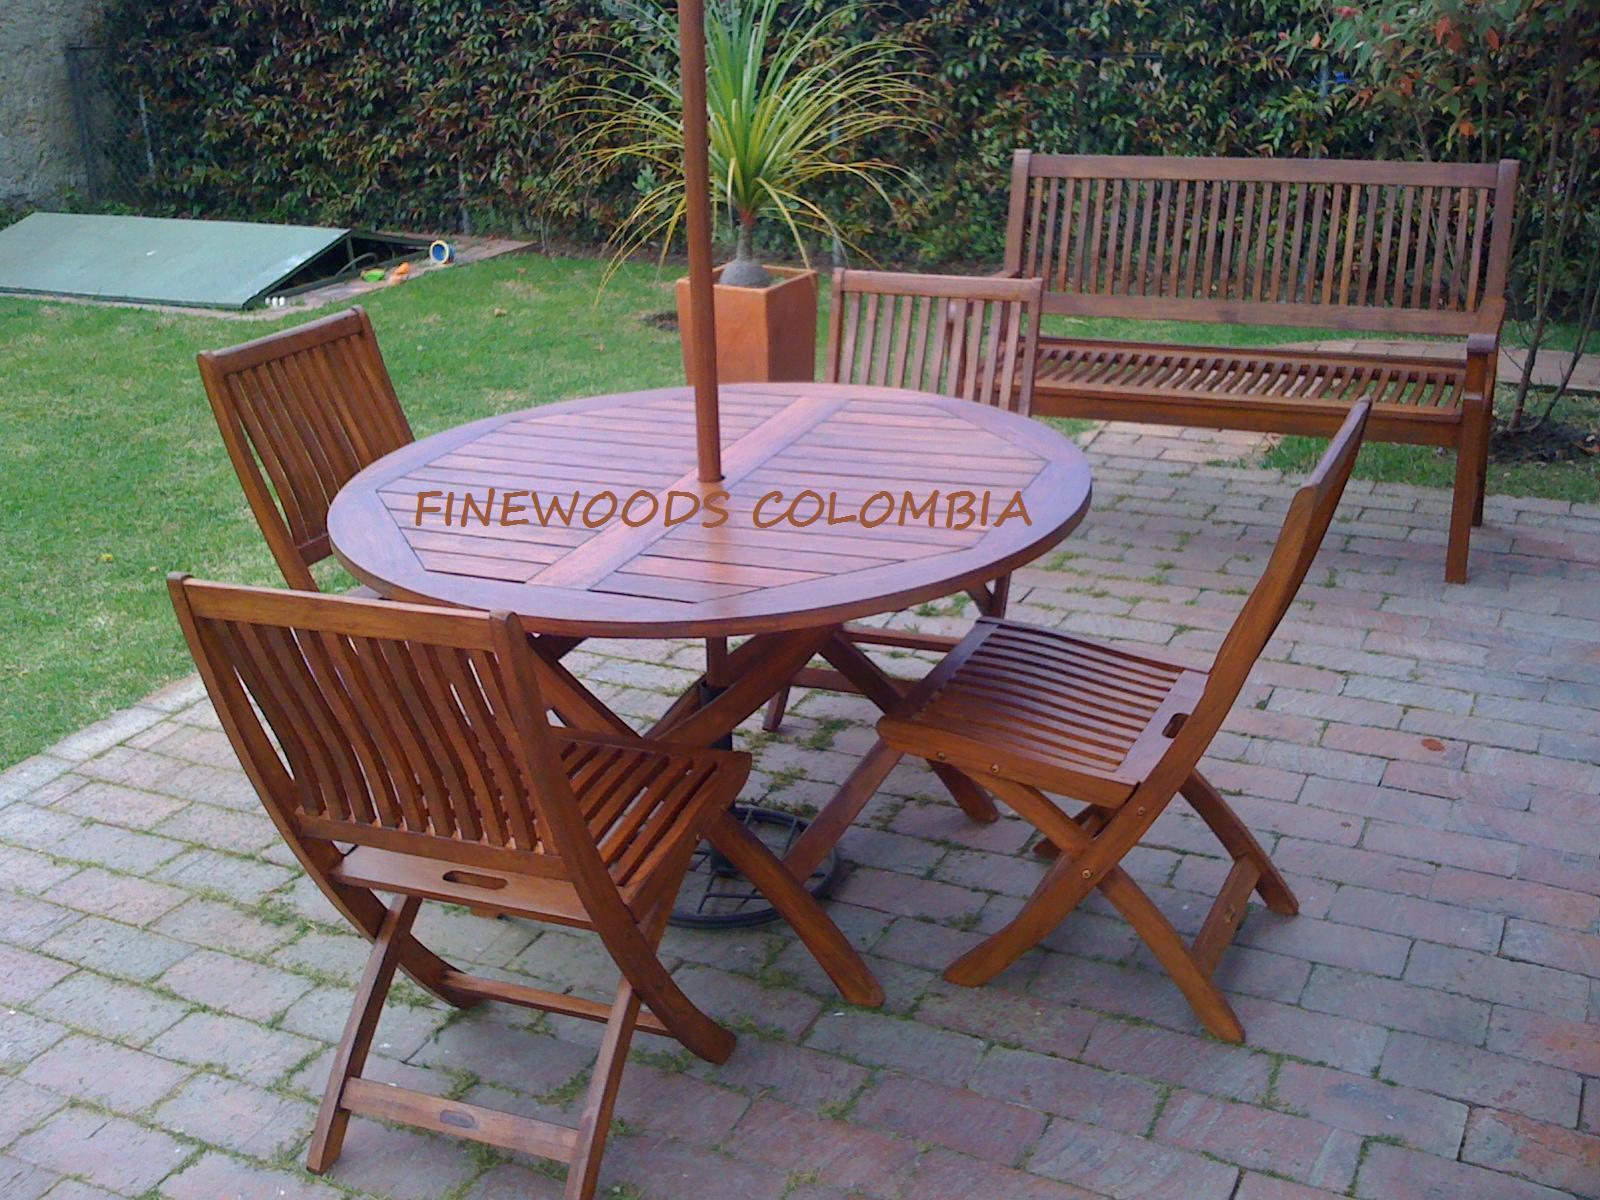 Finewoods colombia muebles exterior - Muebles de madera teca ...